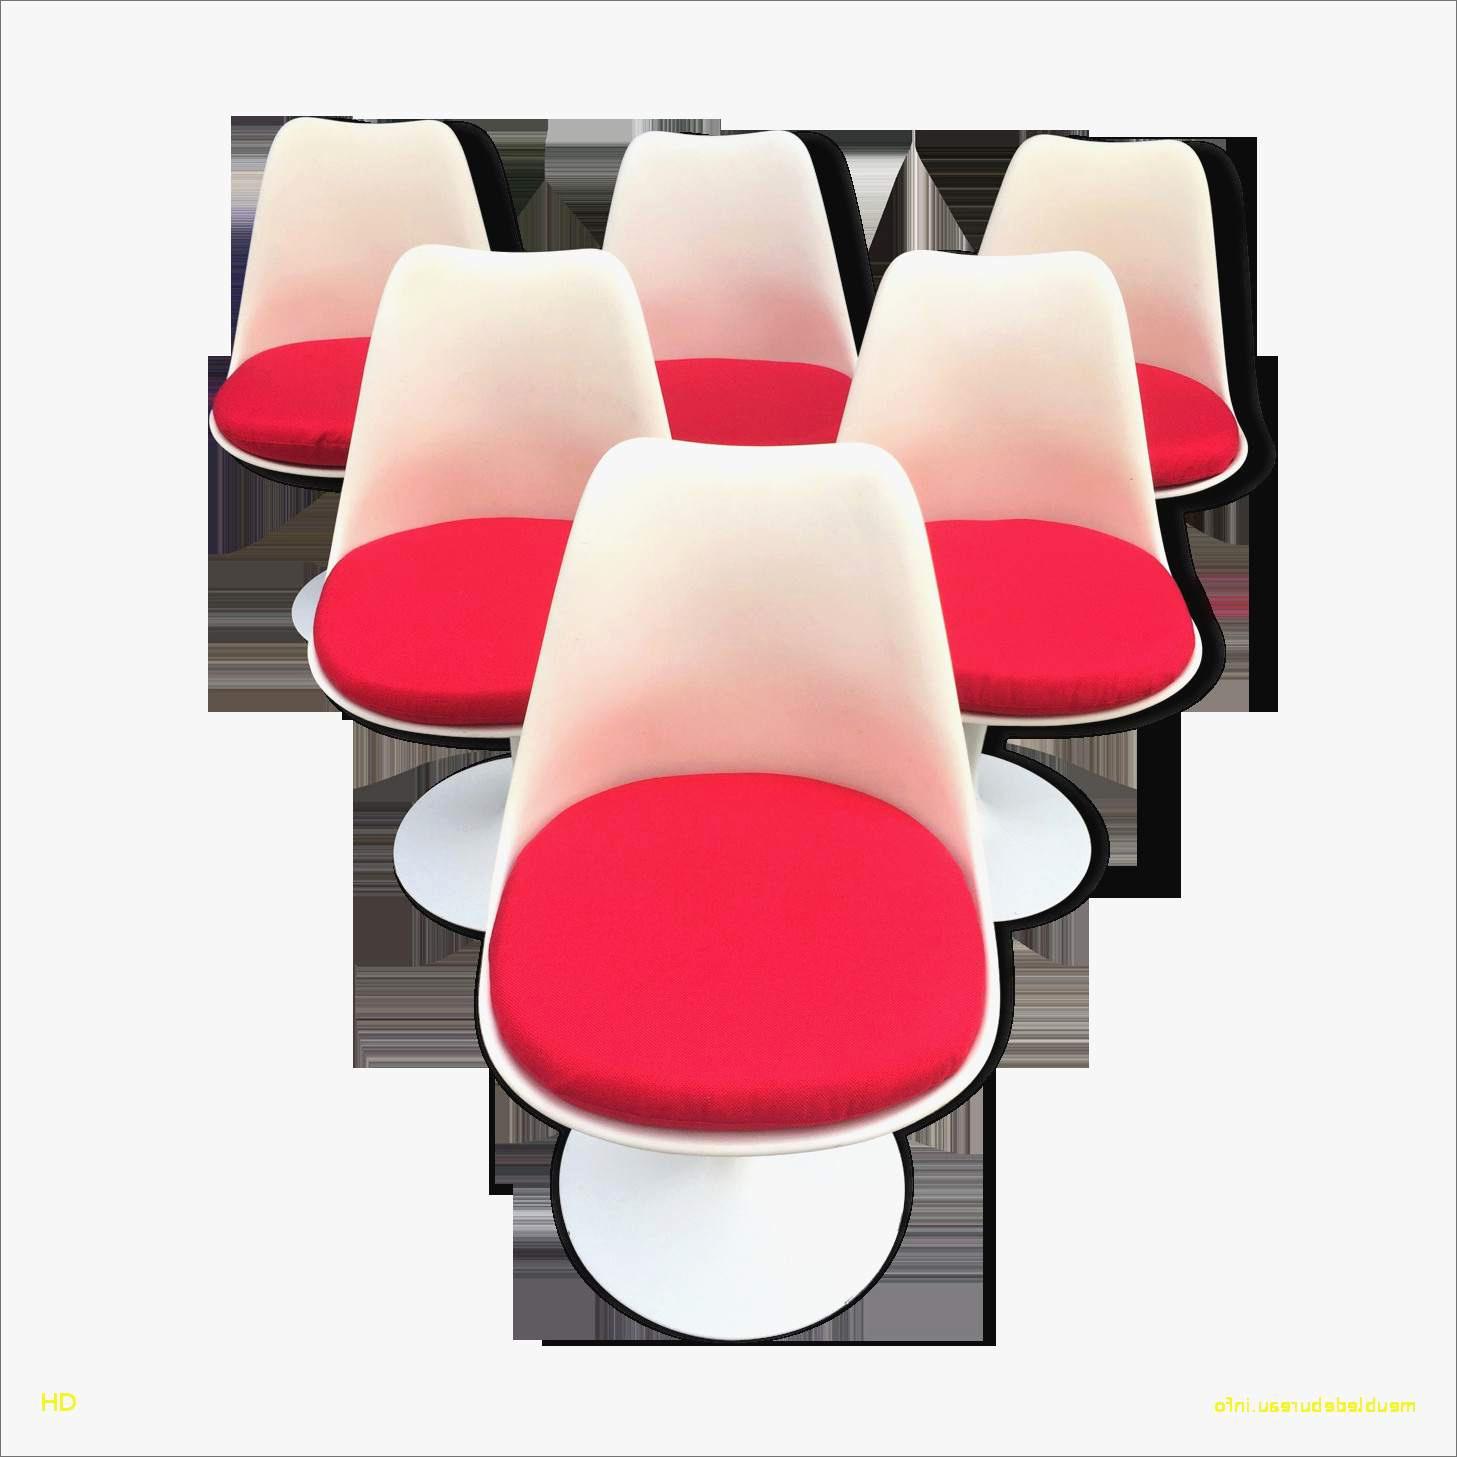 leroy merlin bureau luxe chaise de jardin leroy merlin leroy merlin chaise fauteuil relax of leroy merlin bureau